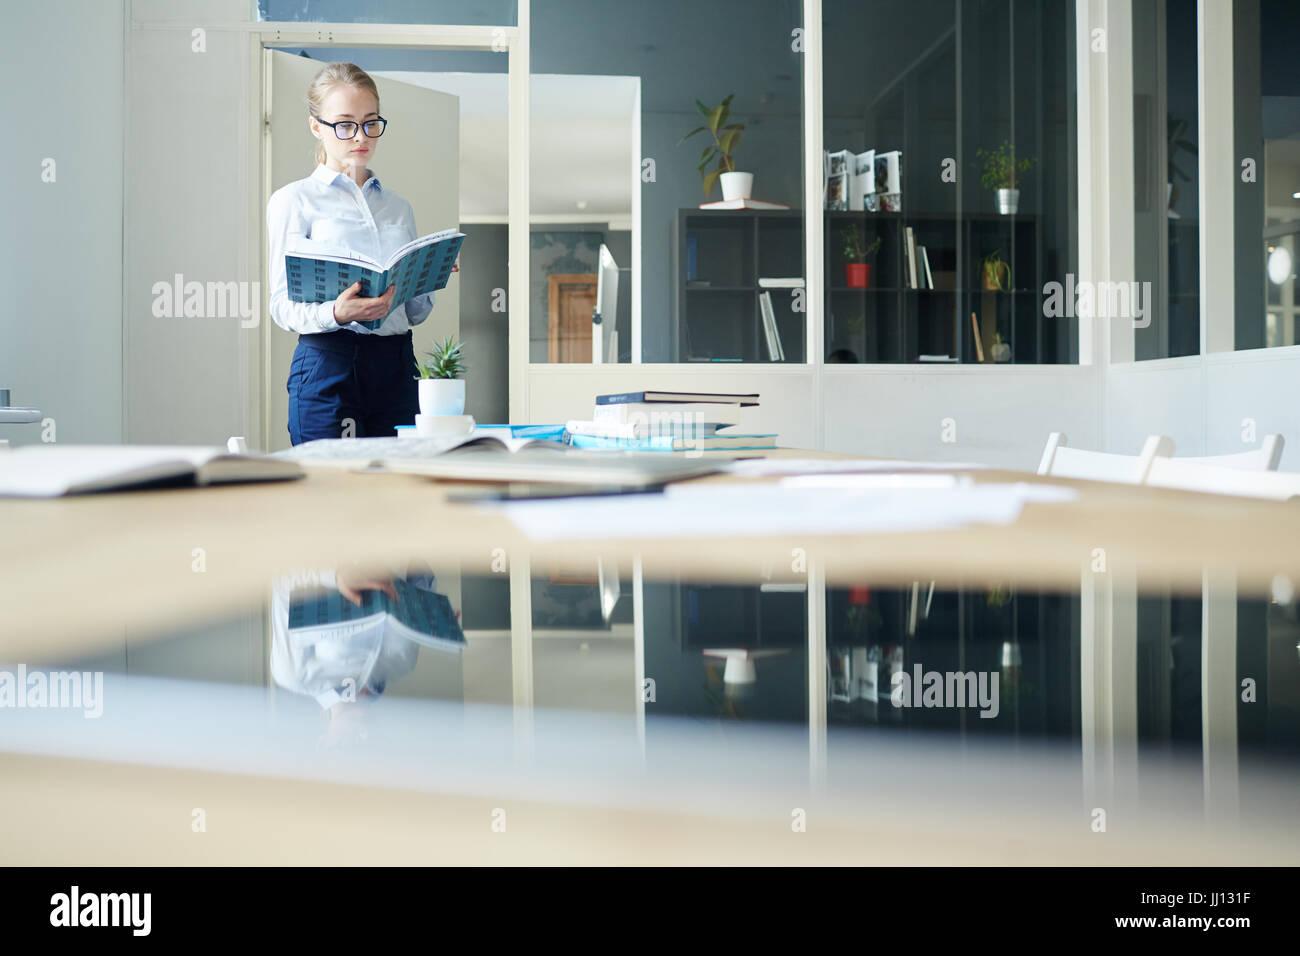 Working accountant - Stock Image